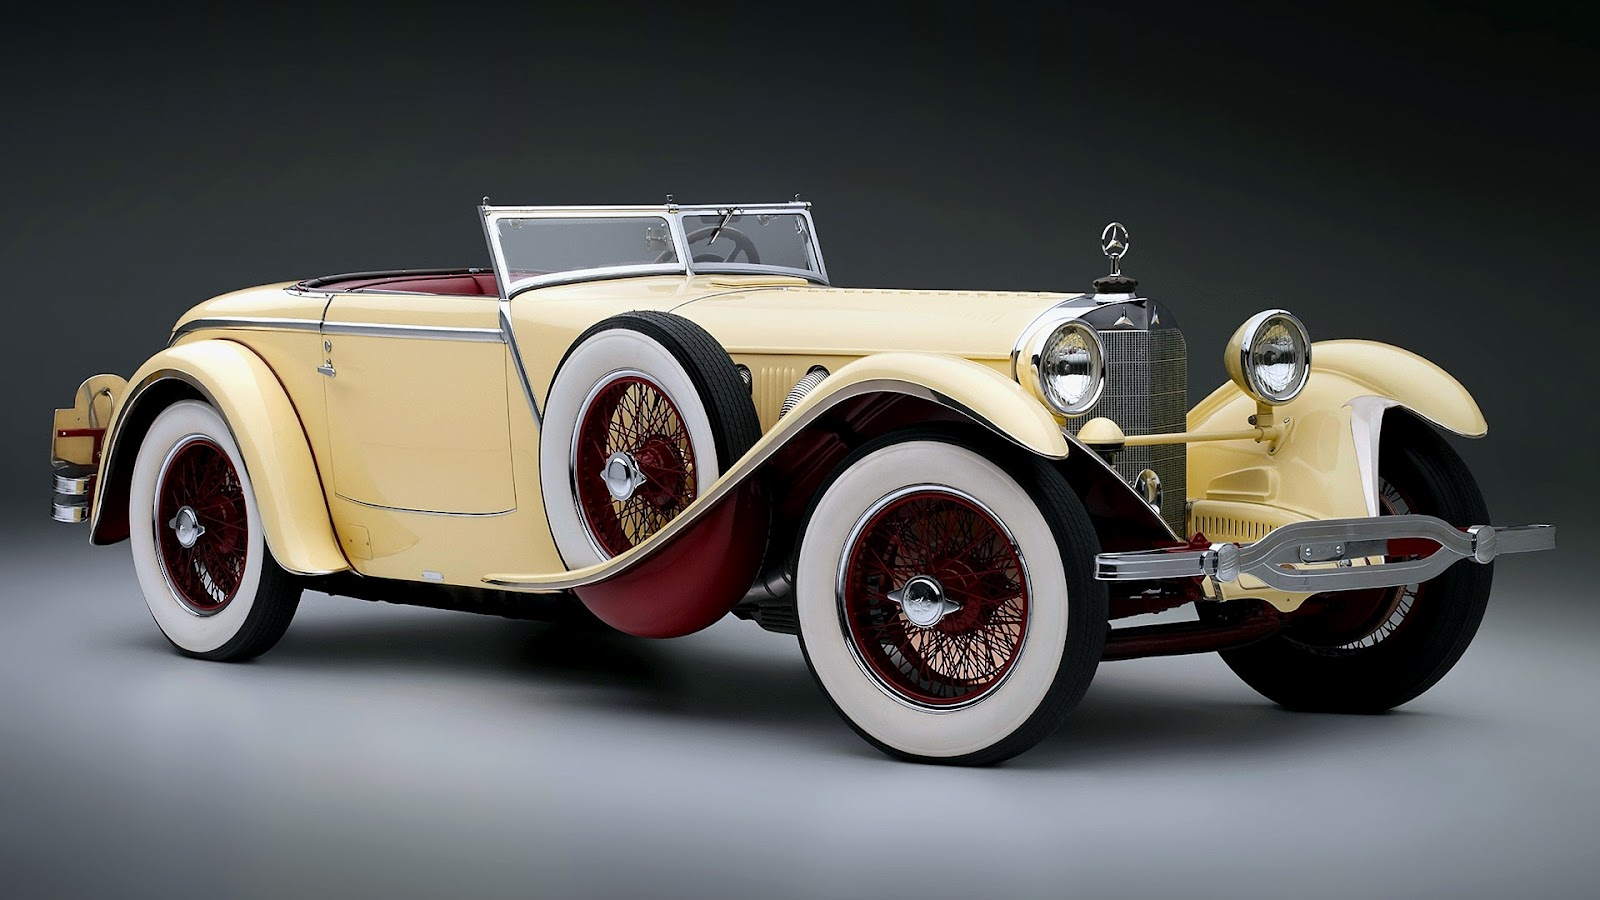 139968d1371190267 vintage cars vintage cars images 1600x900jpg 1600x900